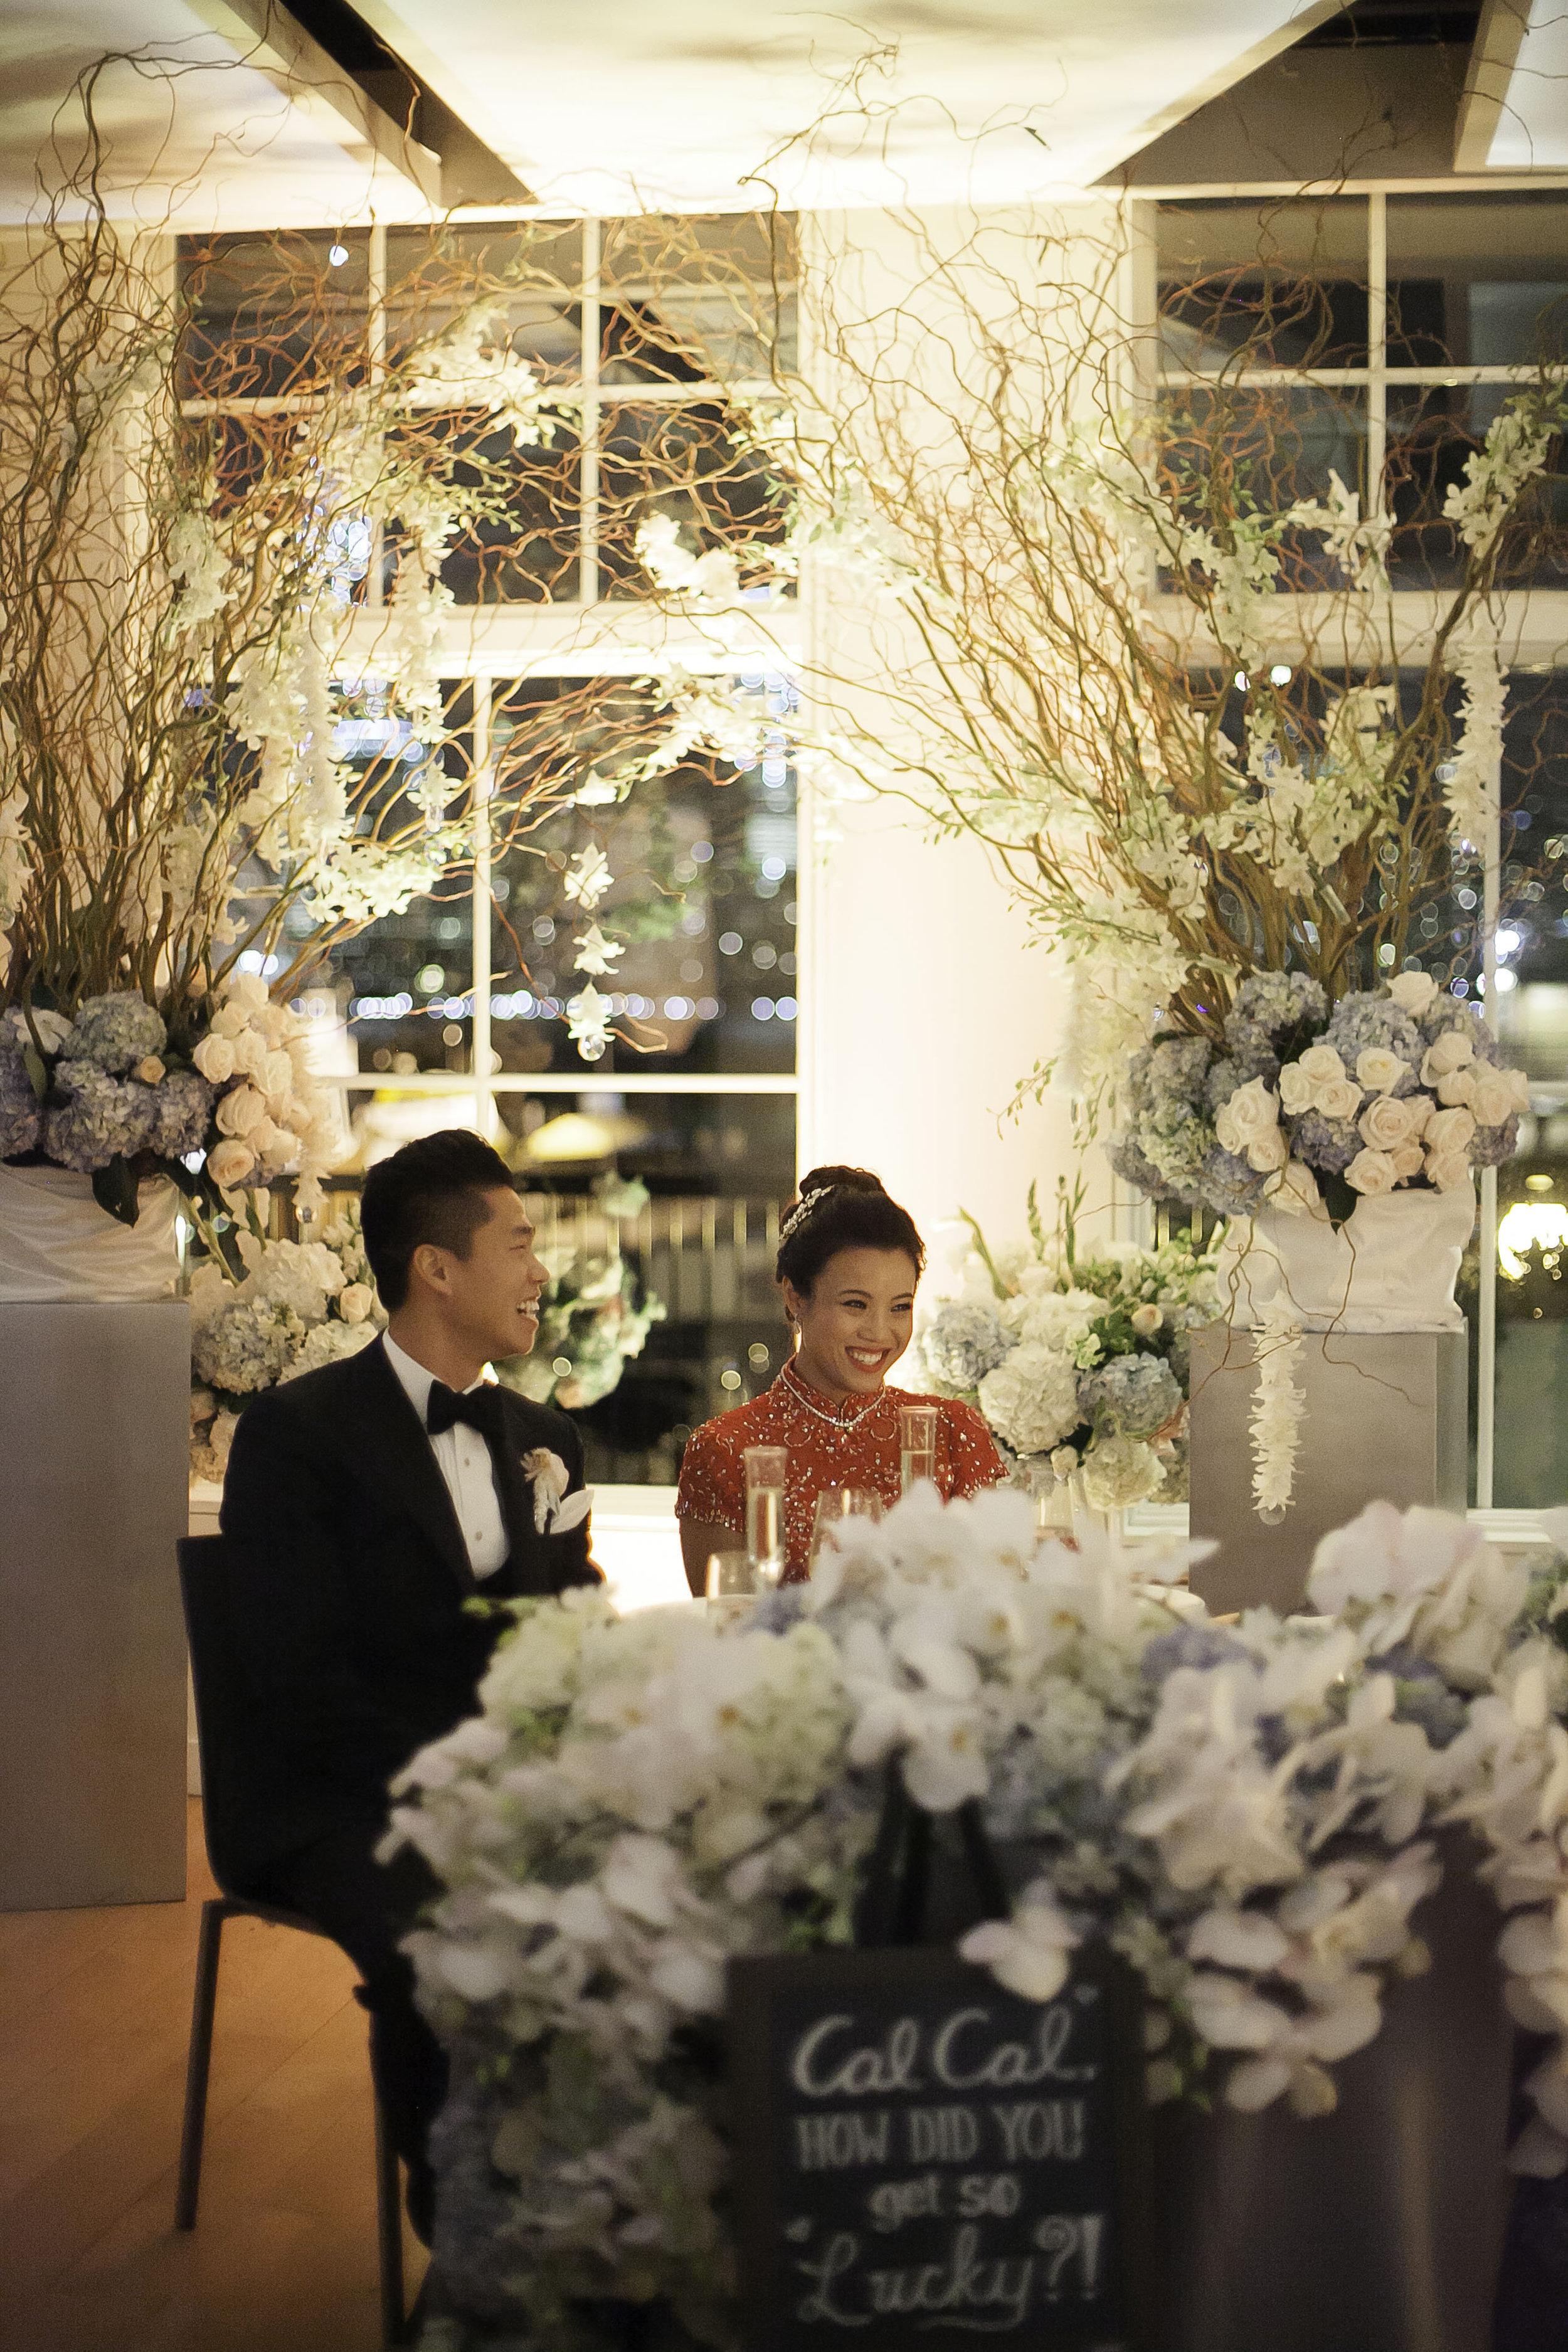 Courtney Calvin s Wedding 10 8 14-1court and cal wedding day-1238.jpg